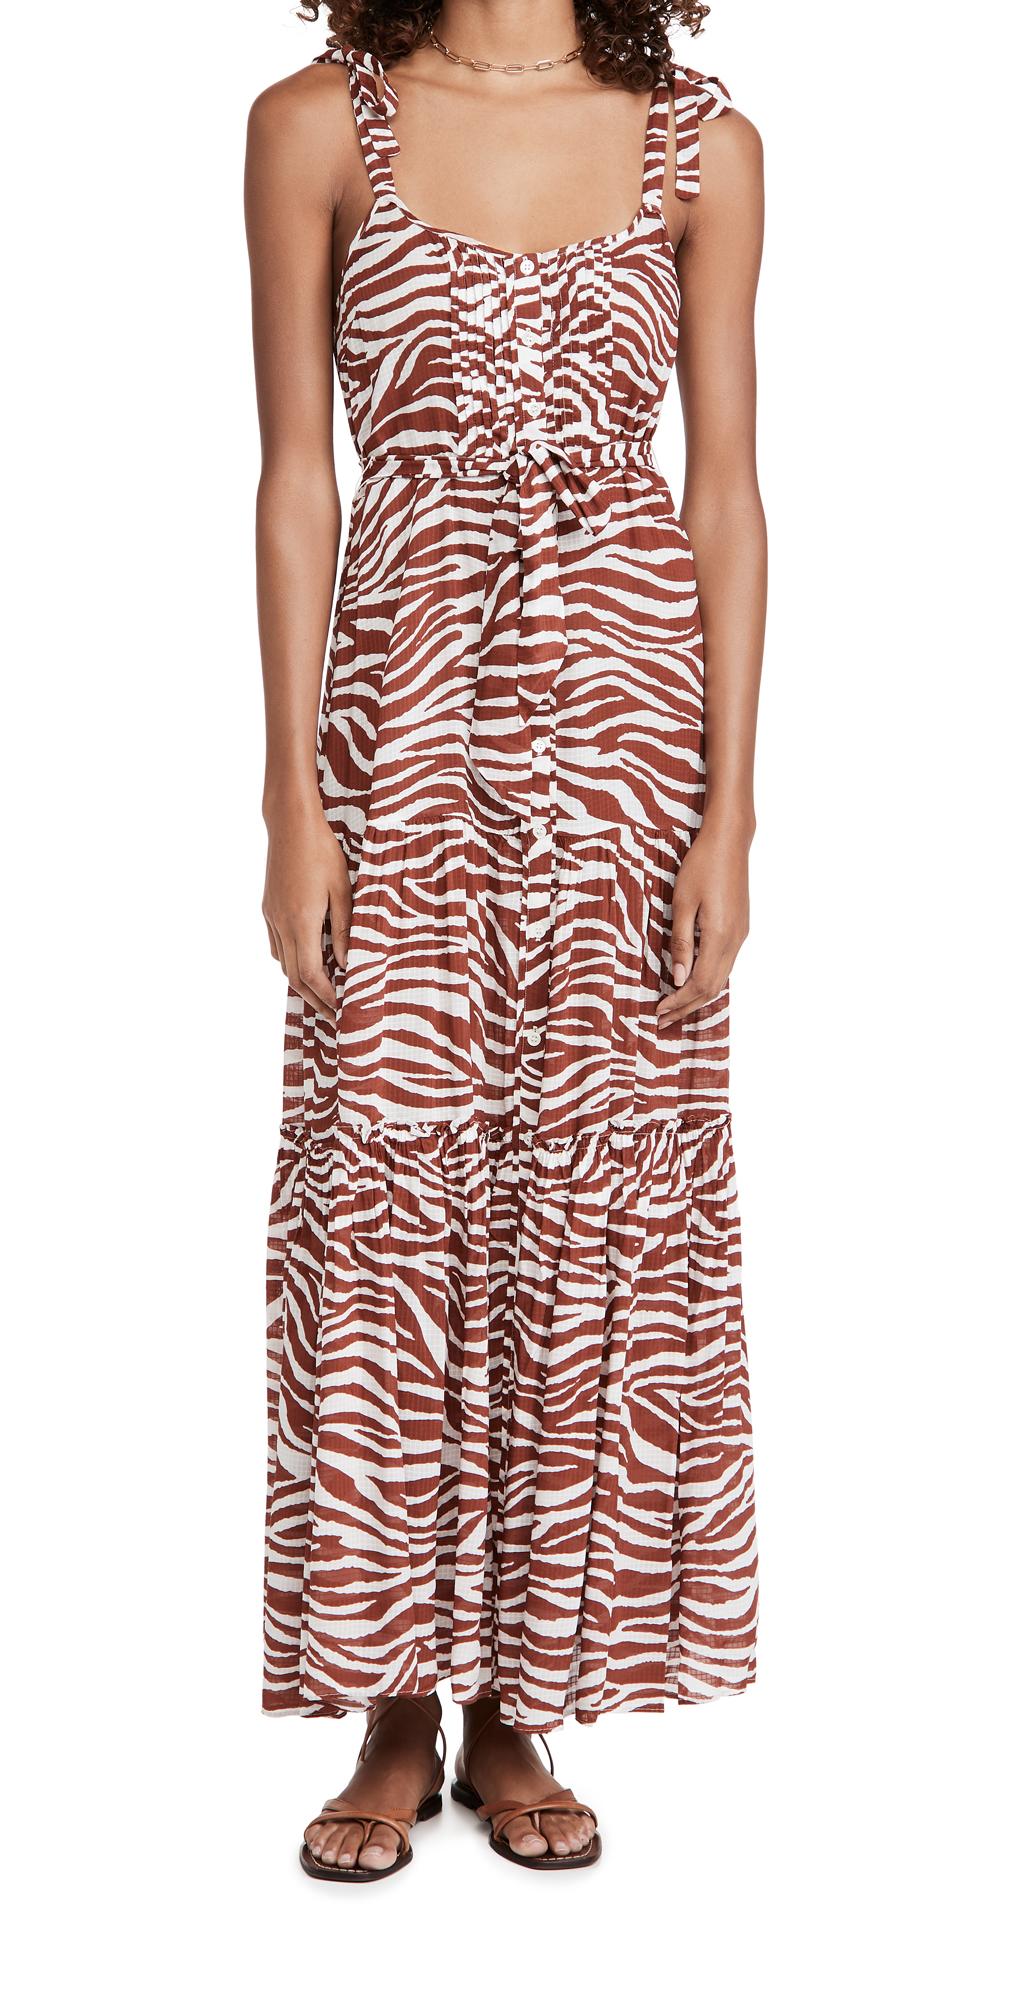 Veronica Beard Michi Dress